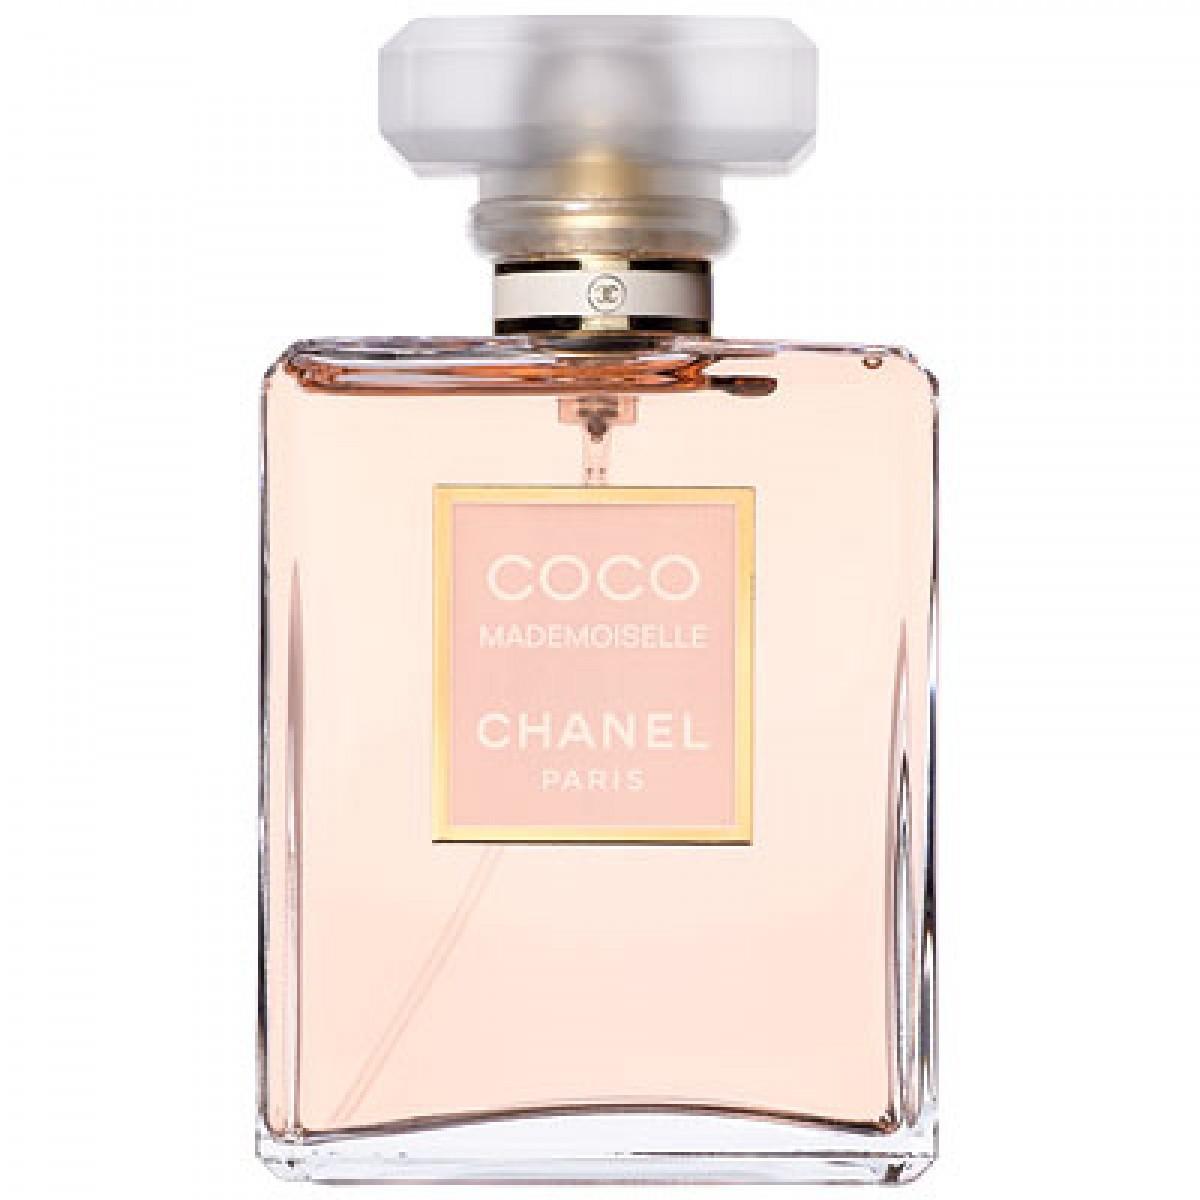 духи Chanel Coco Mademoiselle купить в минске цены Coco